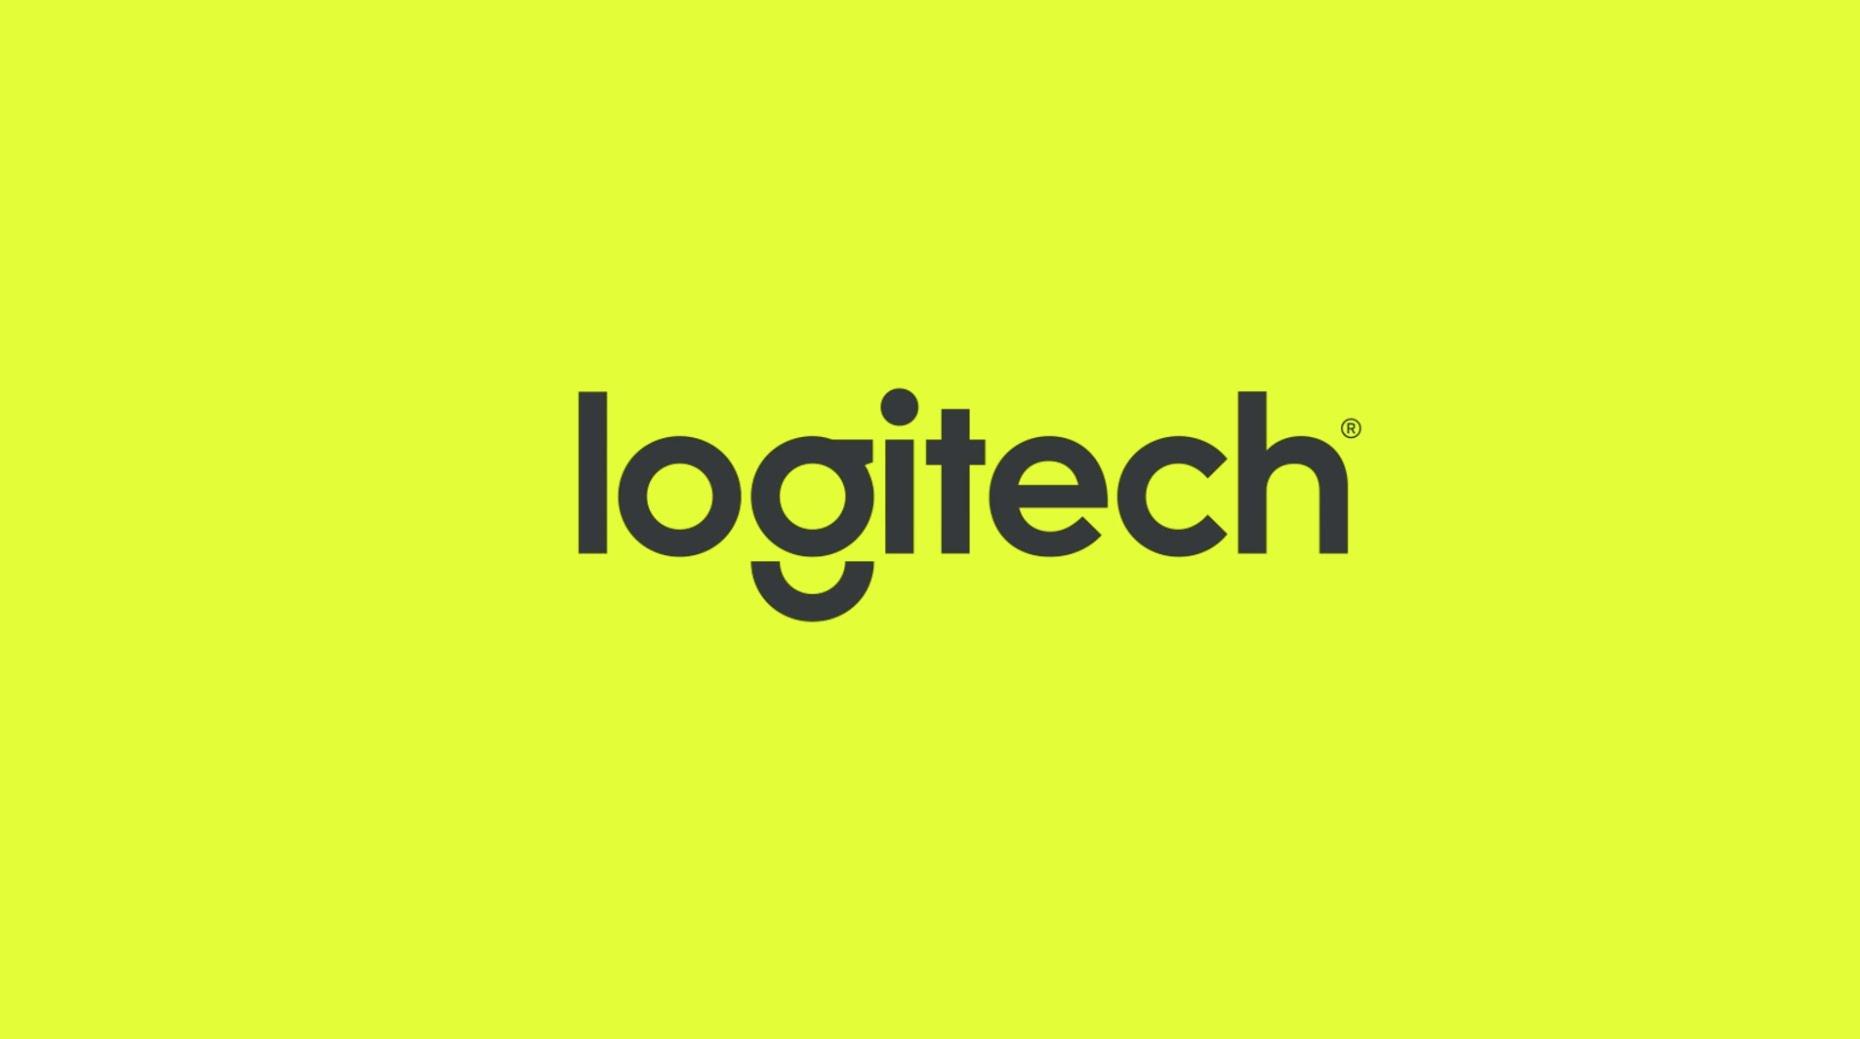 Amazing Logitech Pictures & Backgrounds